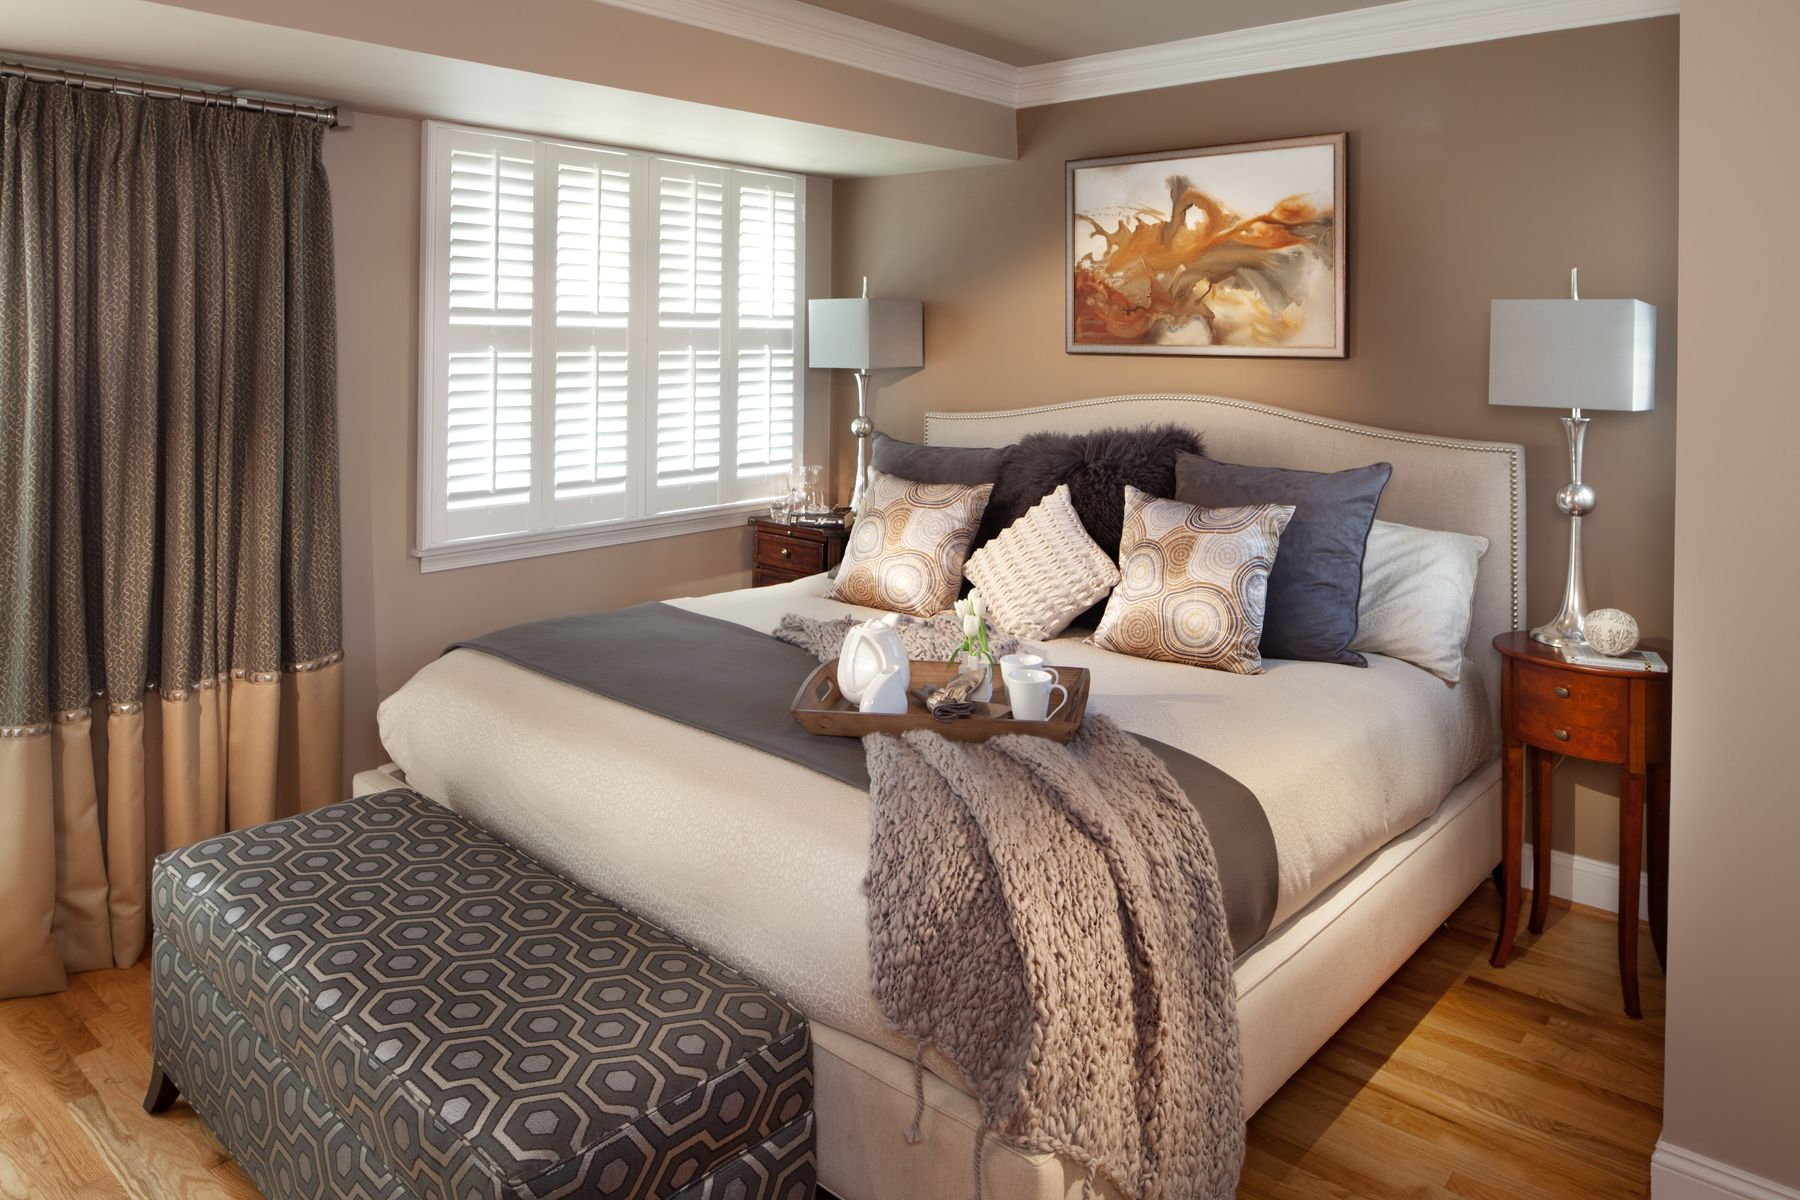 Warm Bedroom Design - Bedroom | Awesome Home Design for You!